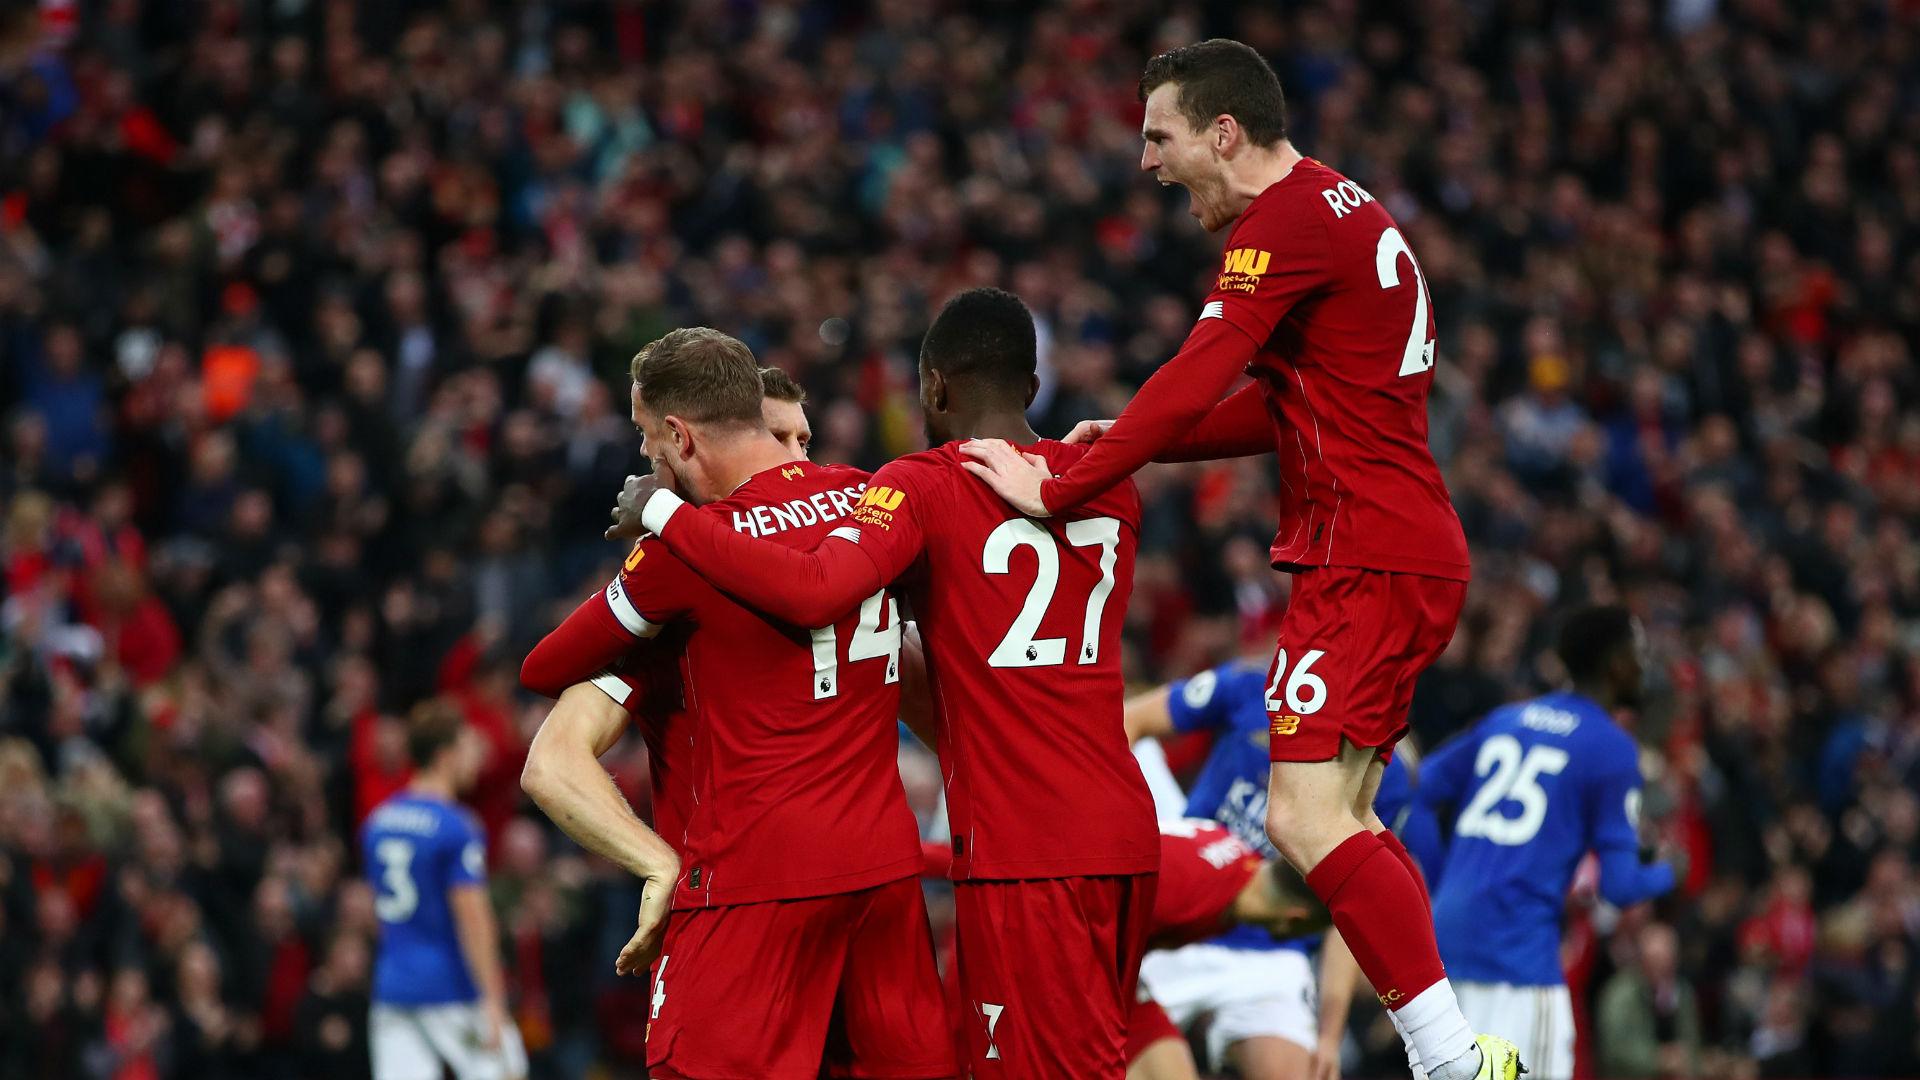 Origi the GOAT? Robertson lauds Liverpool's derby star